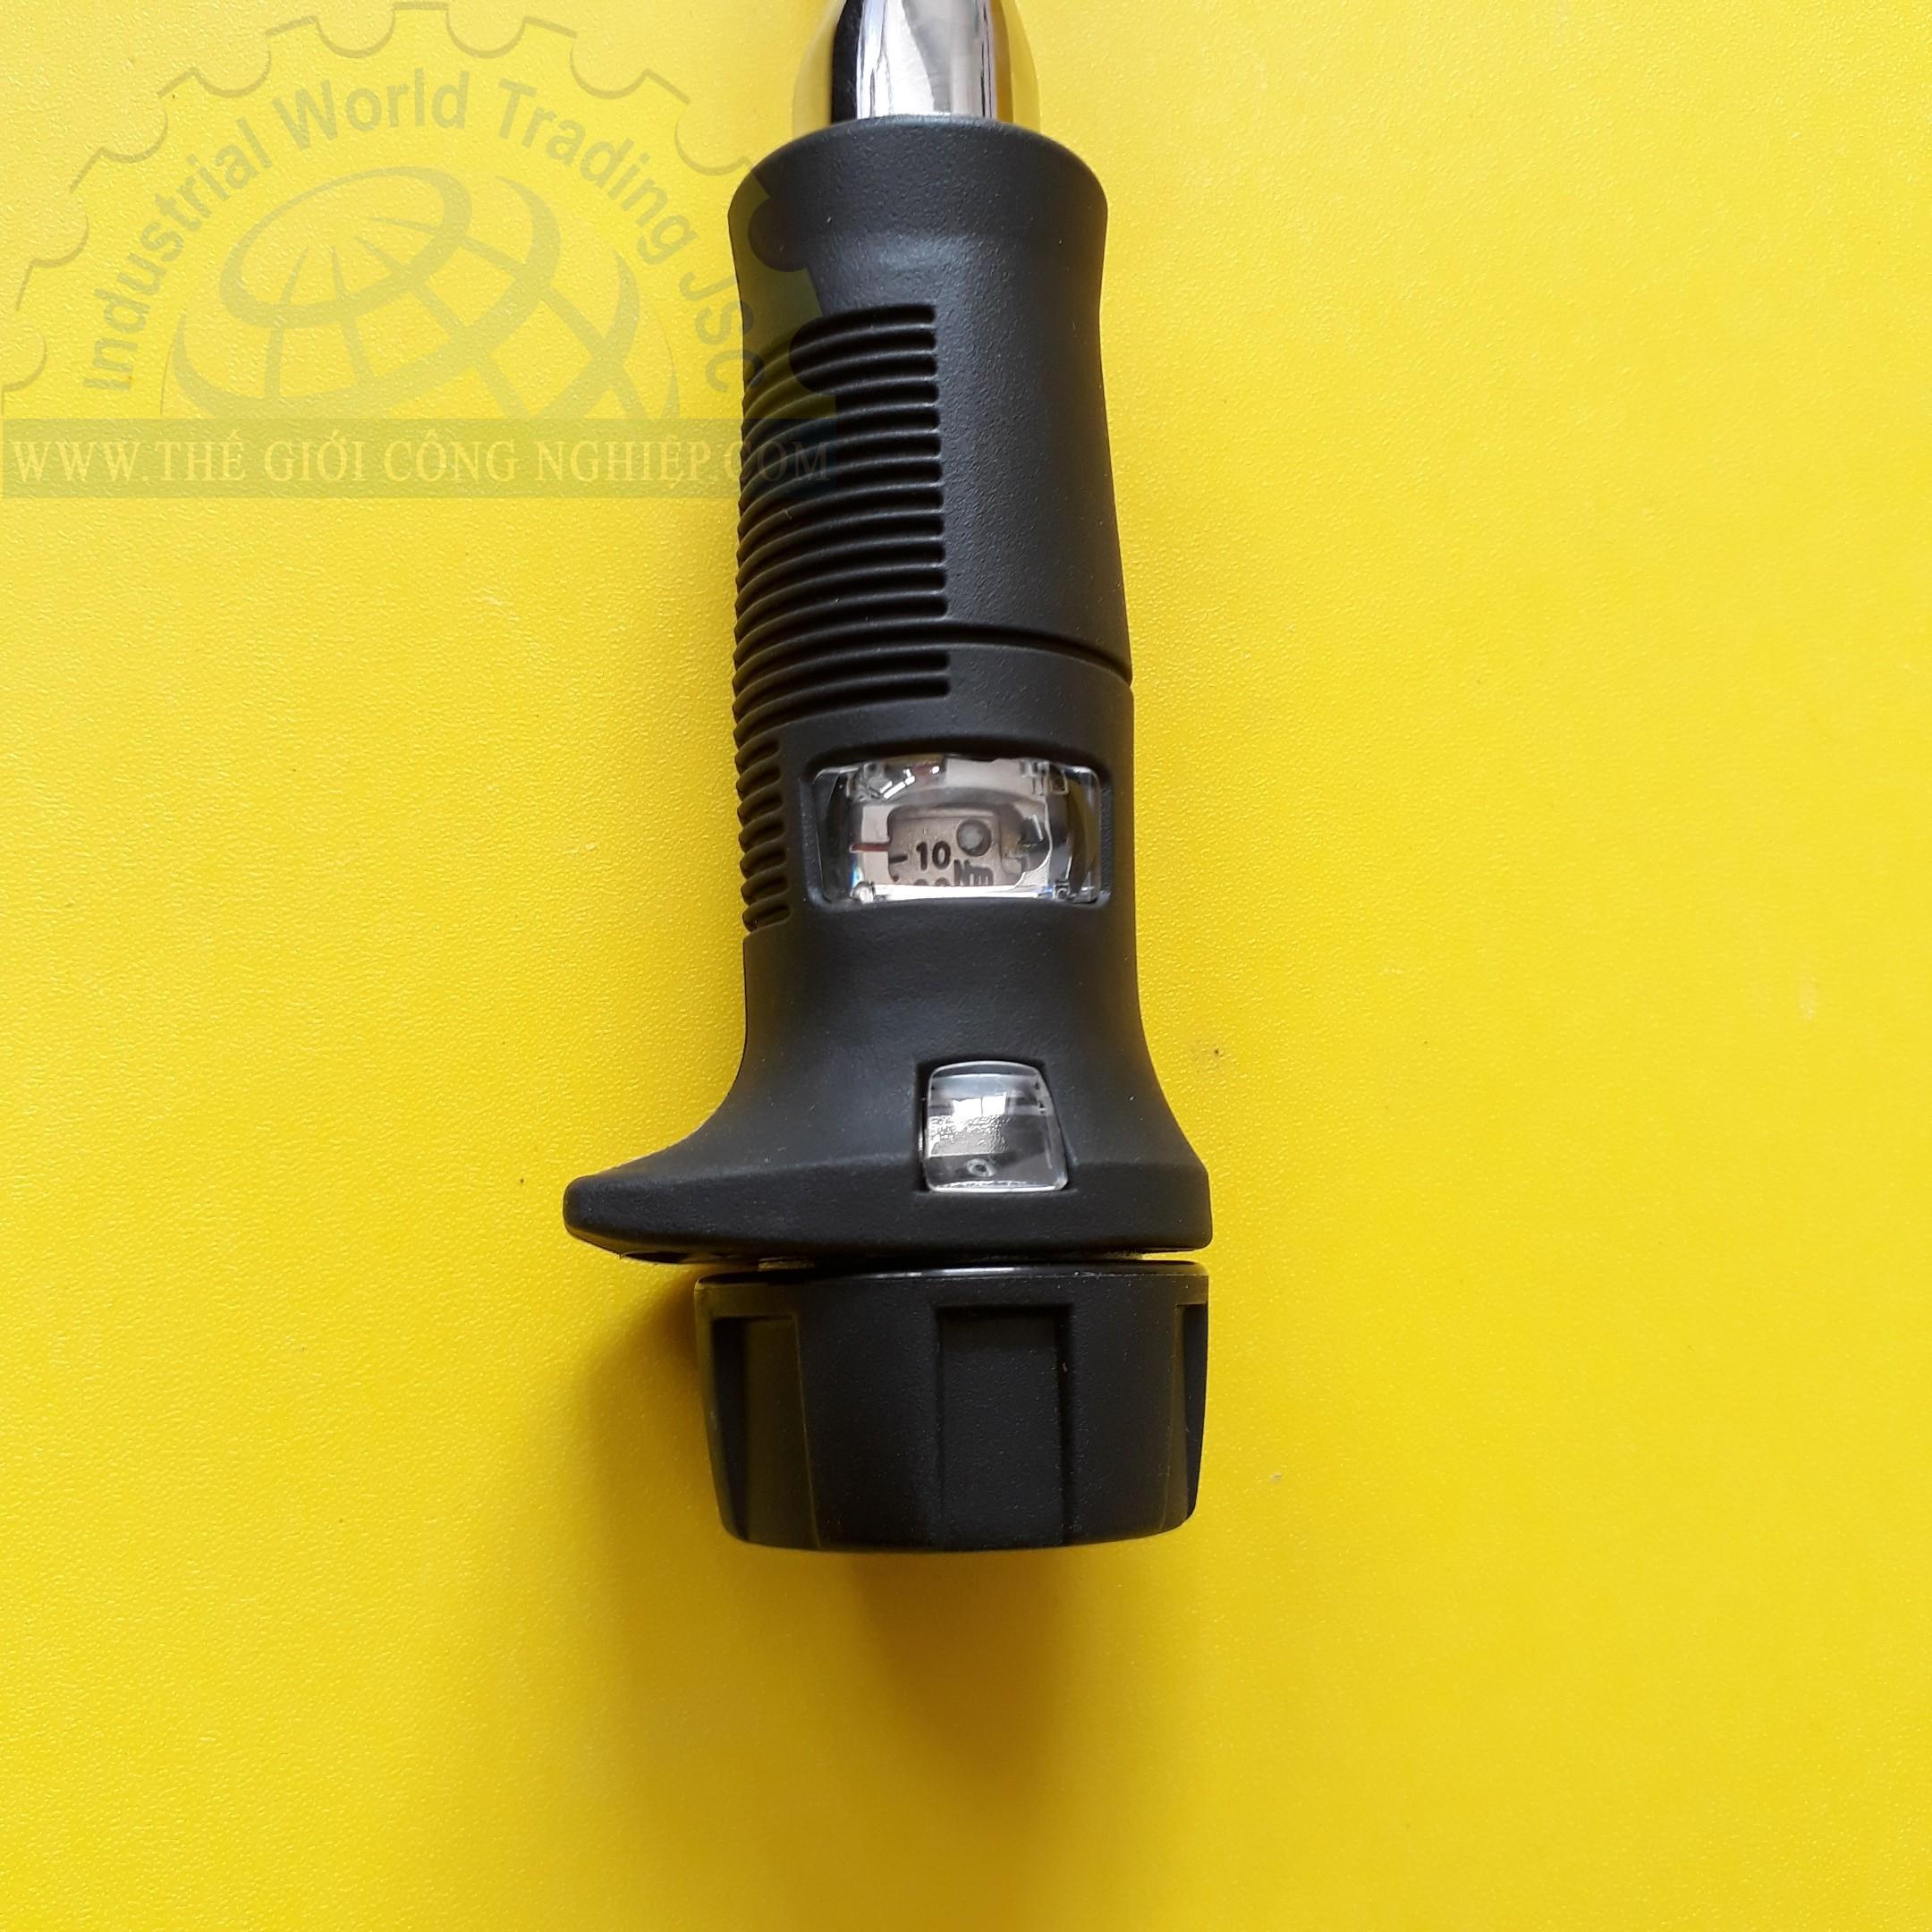 Torque Wrench QL50N Tohnichi